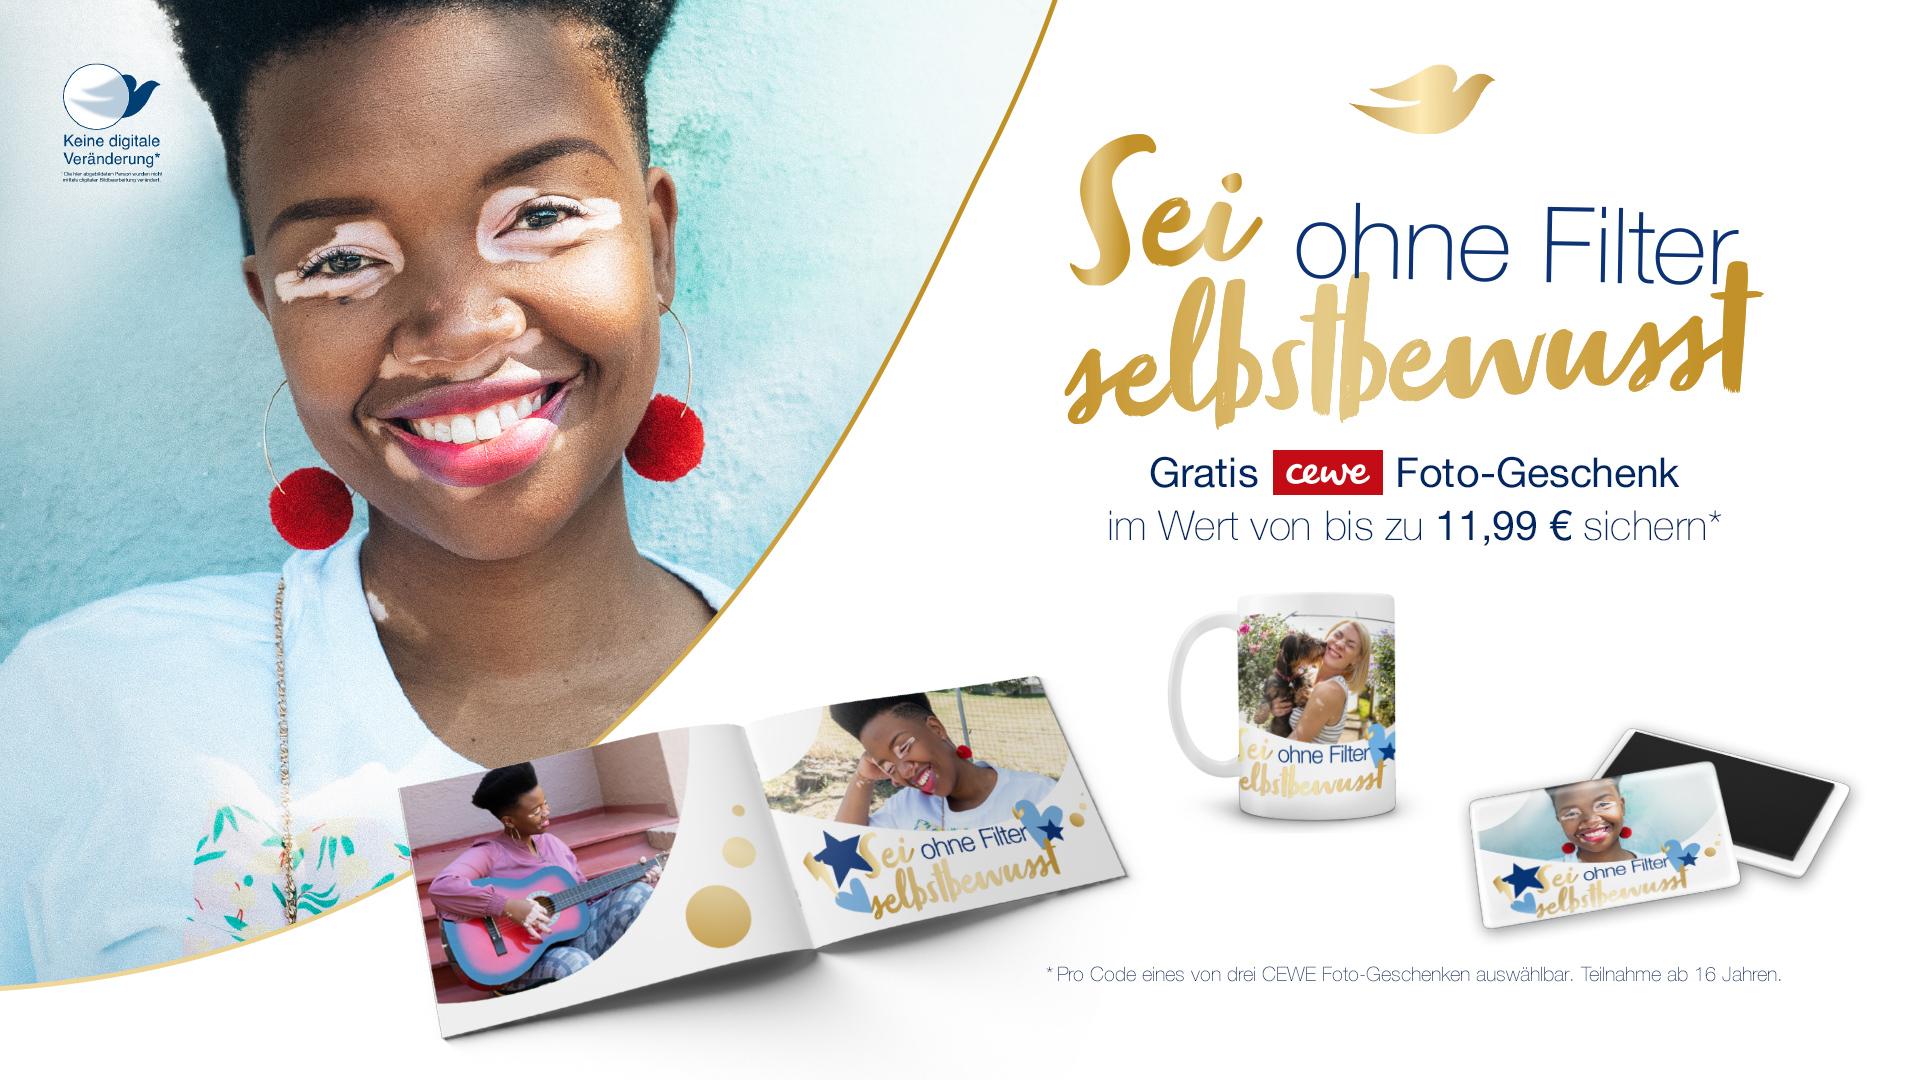 Unilever Friends - Sei ohne Filter selbstbewusst